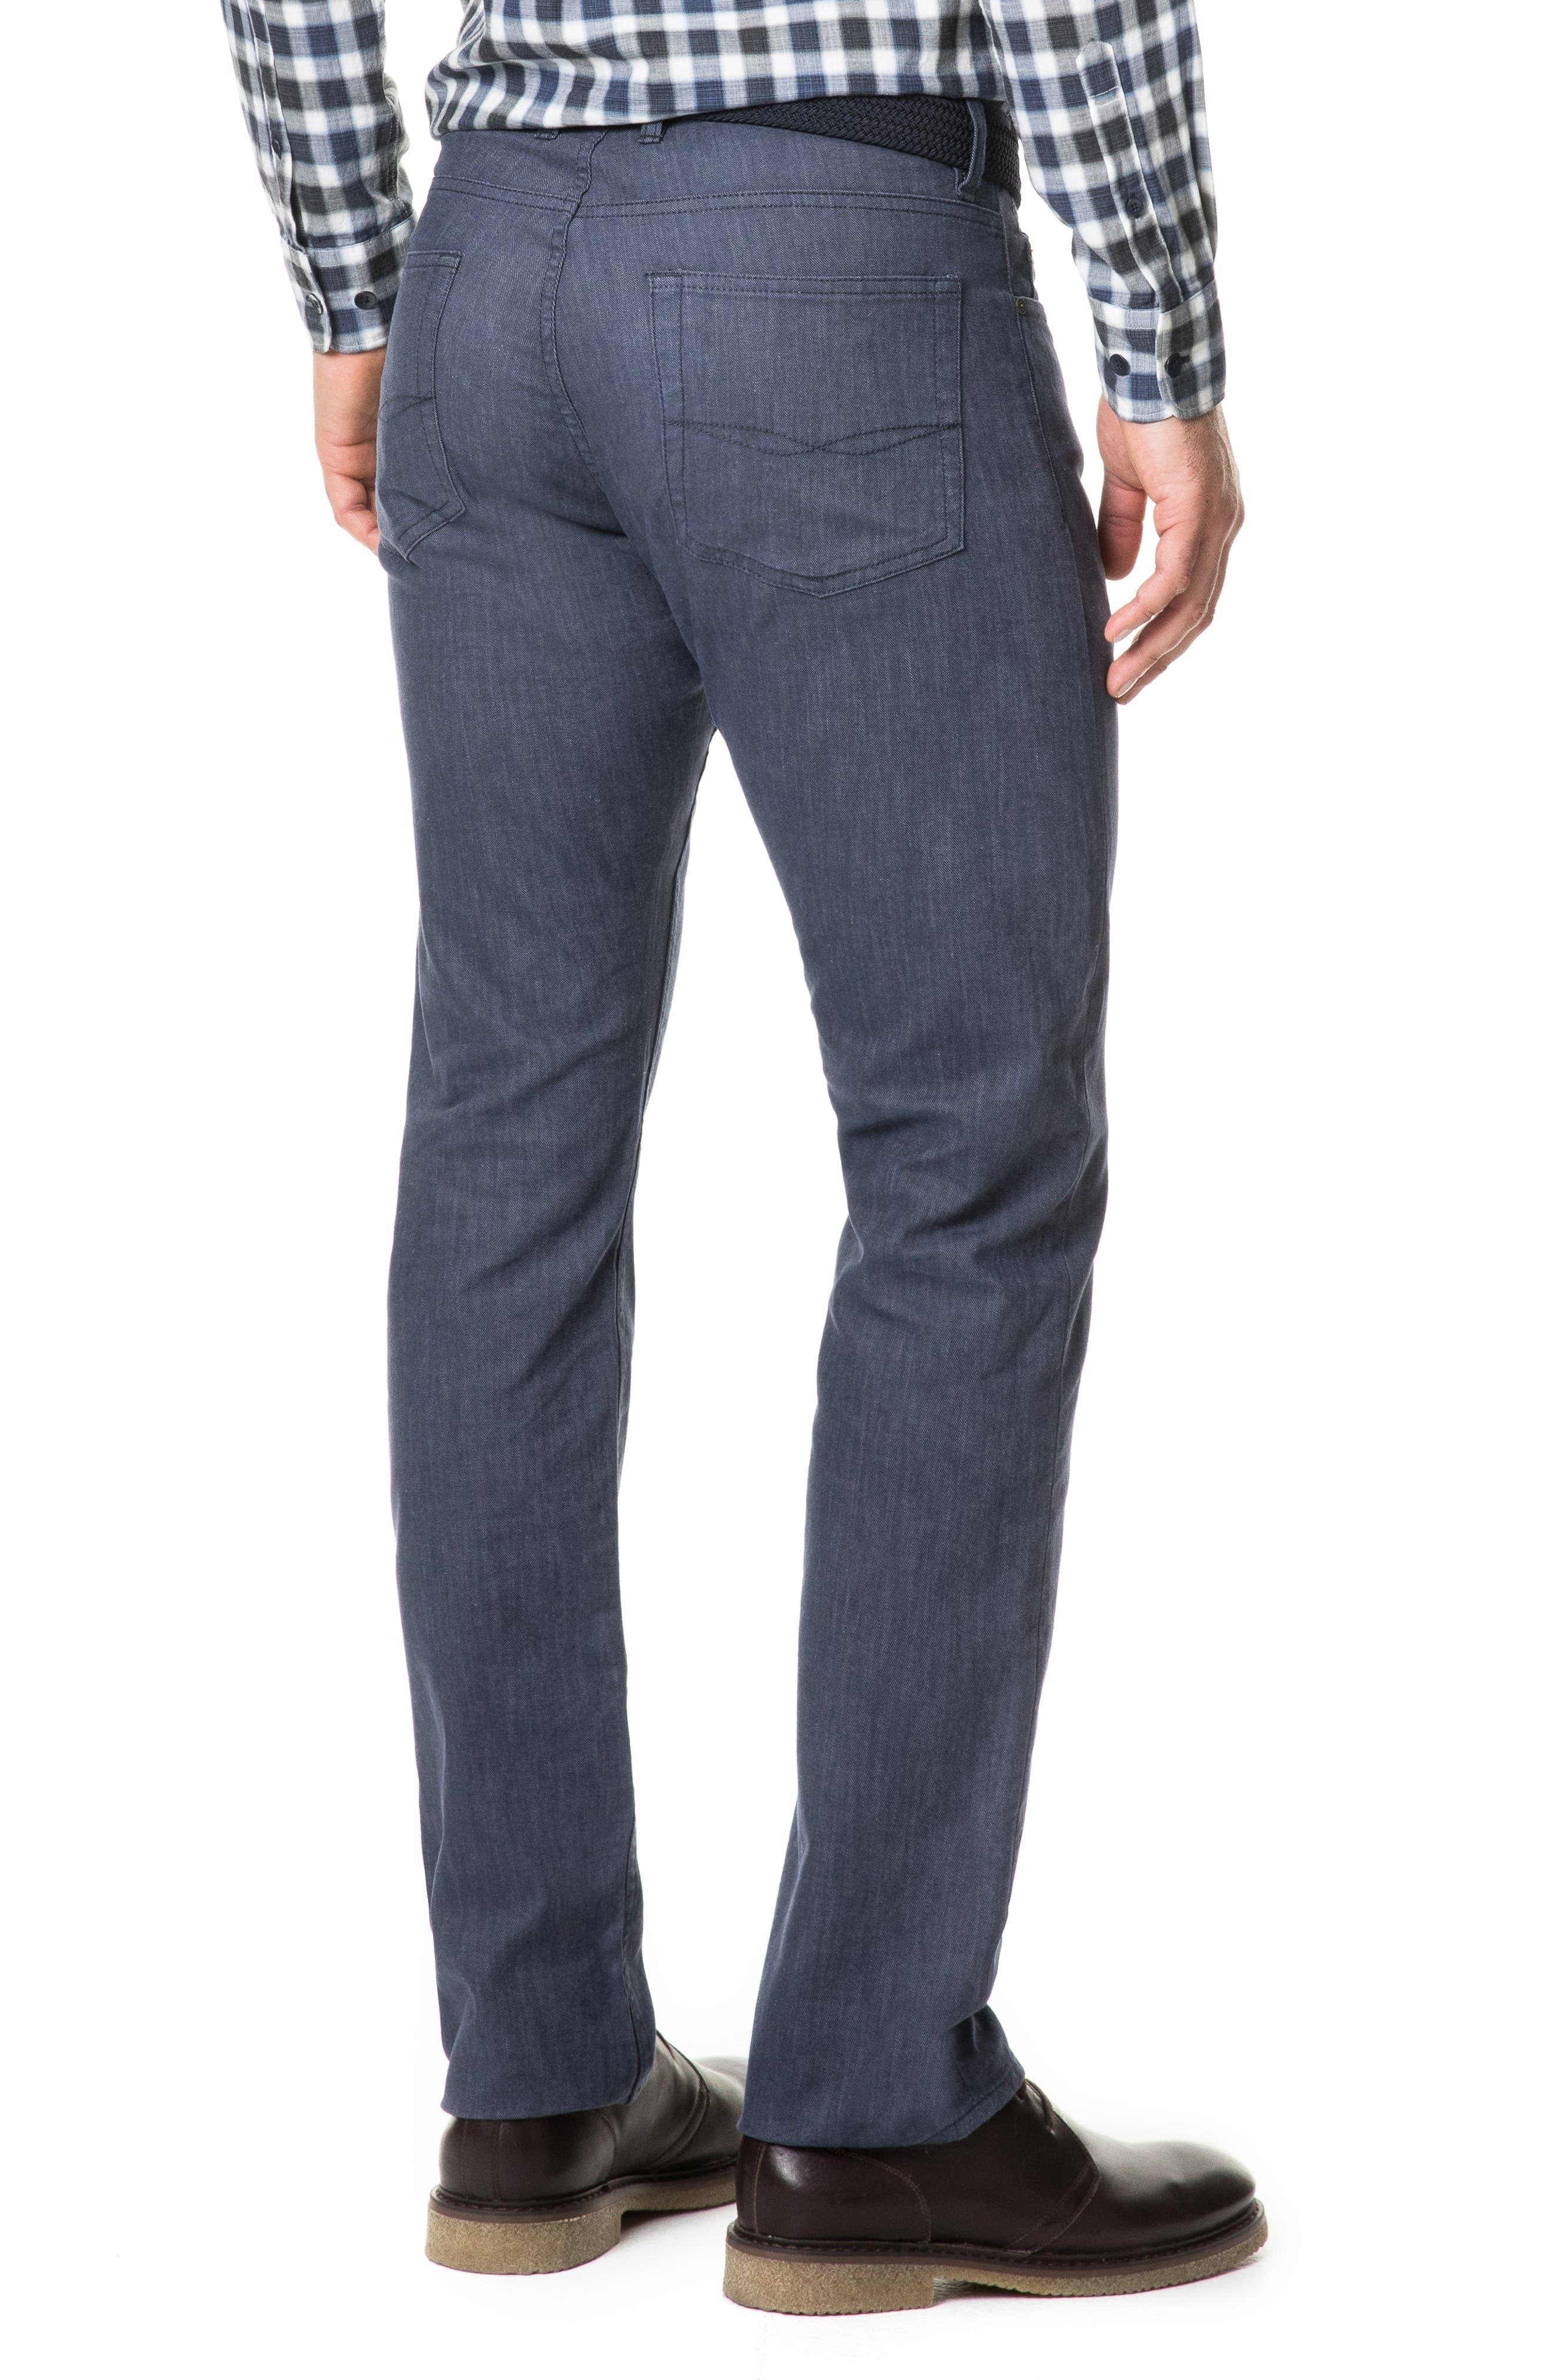 Amisfield Regular Fit Jeans,                             Alternate thumbnail 2, color,                             DUSK